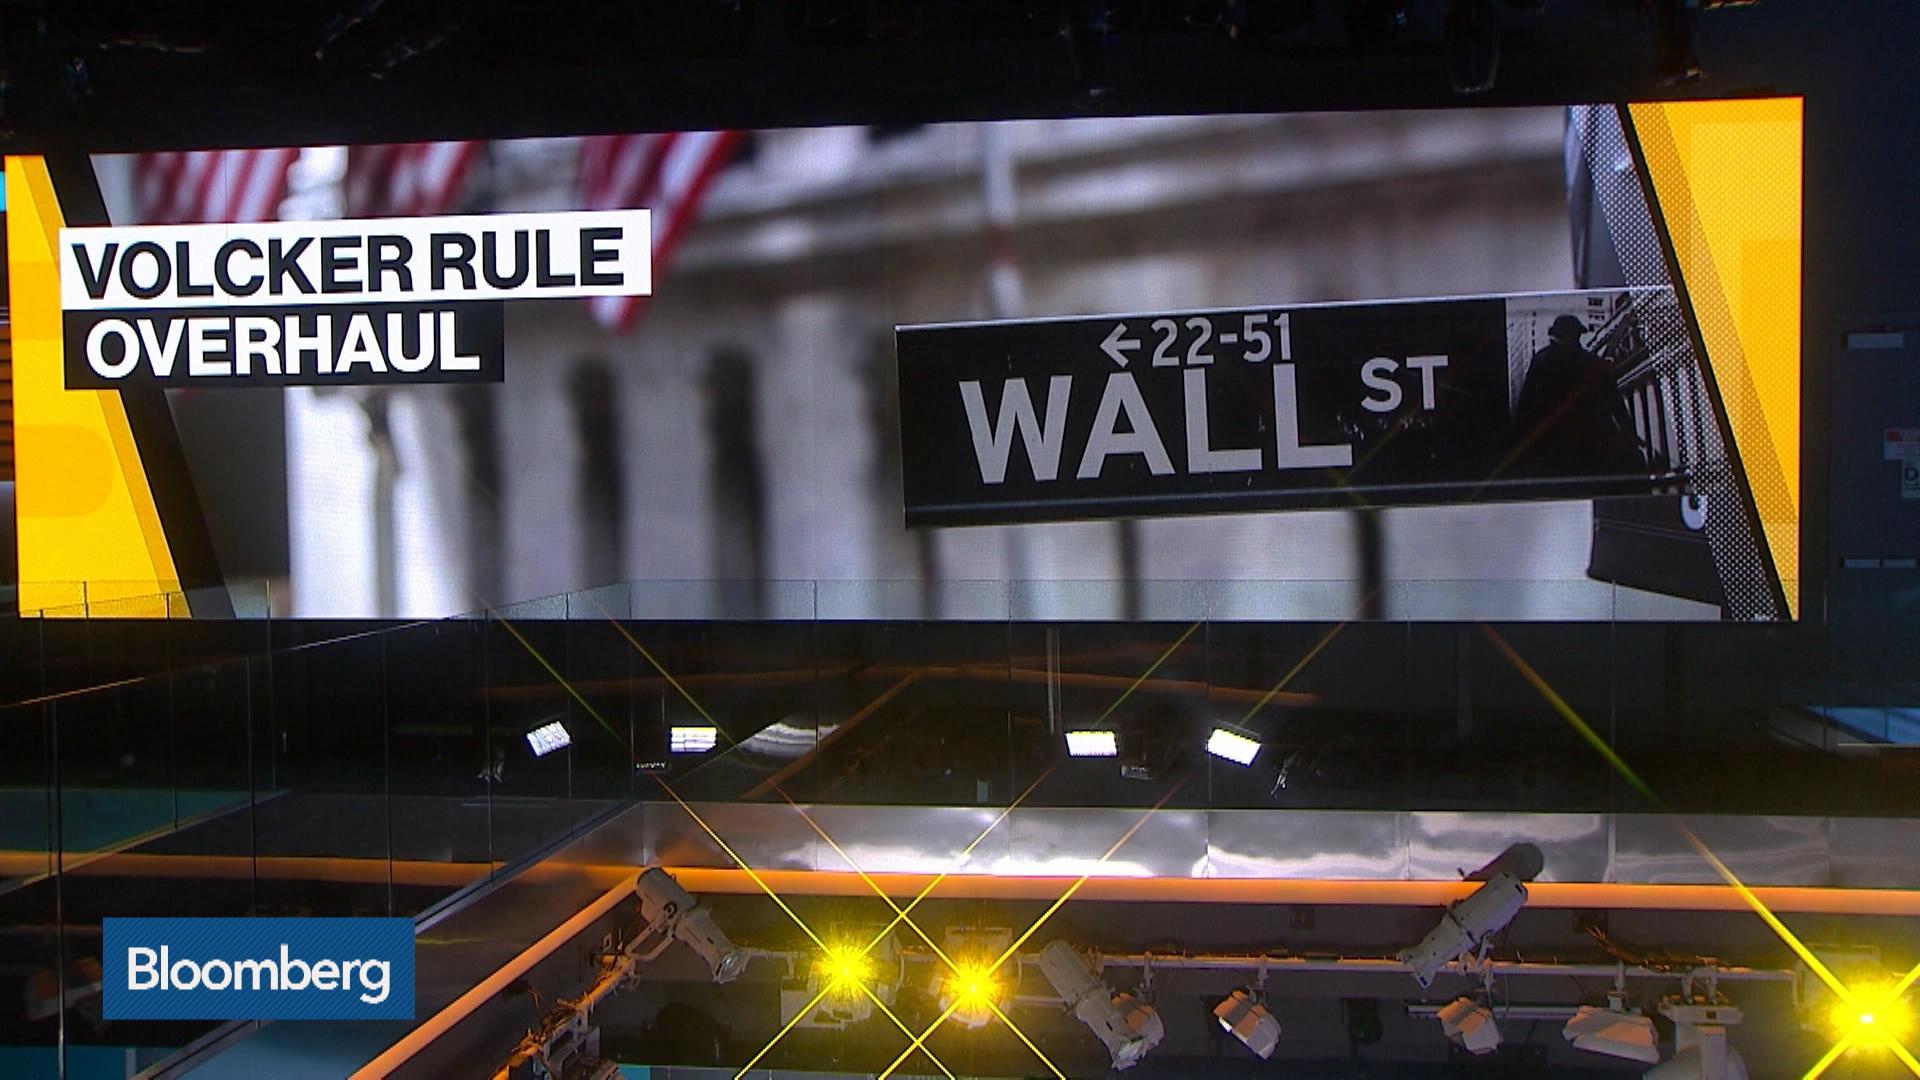 Volcker Rule Overhaul Ready to Hit Wall Street